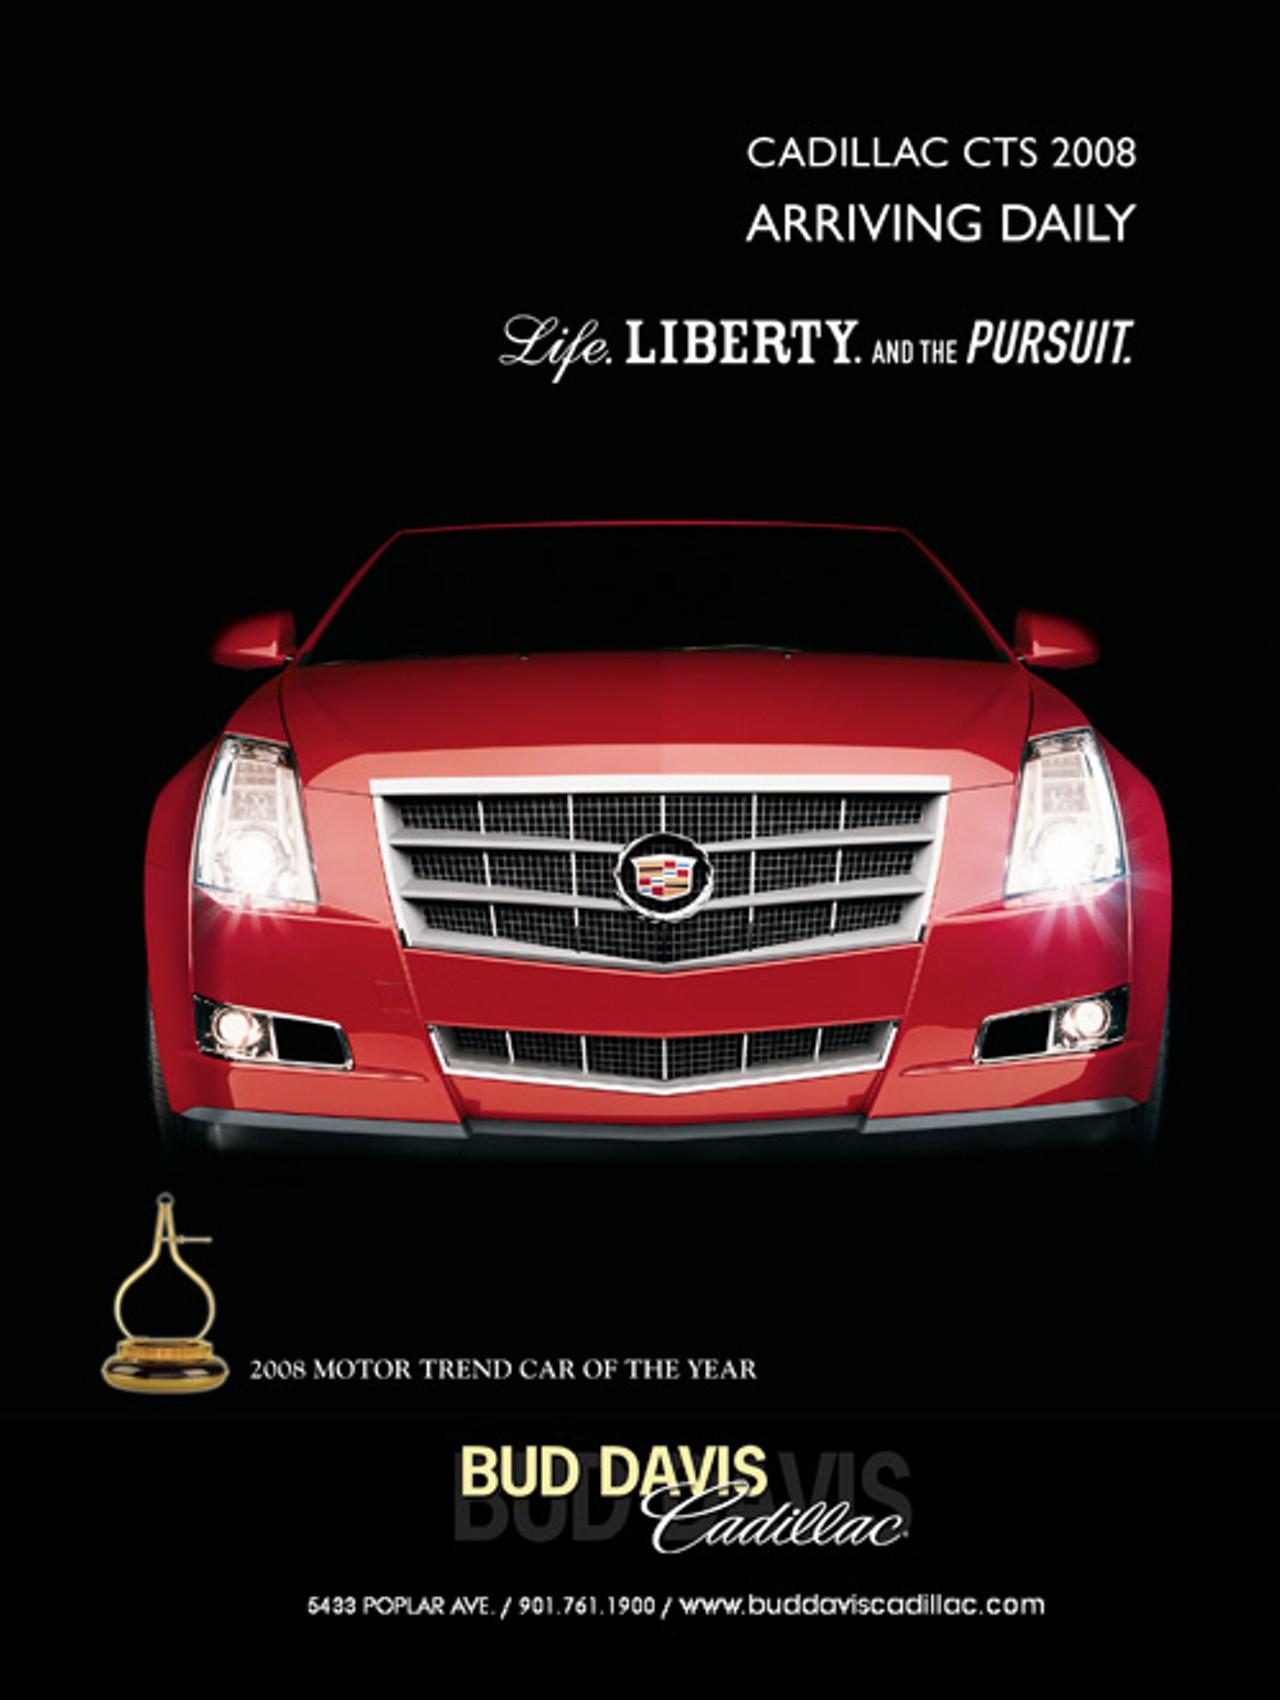 bud davis cadillac east memphis automotive services. Black Bedroom Furniture Sets. Home Design Ideas